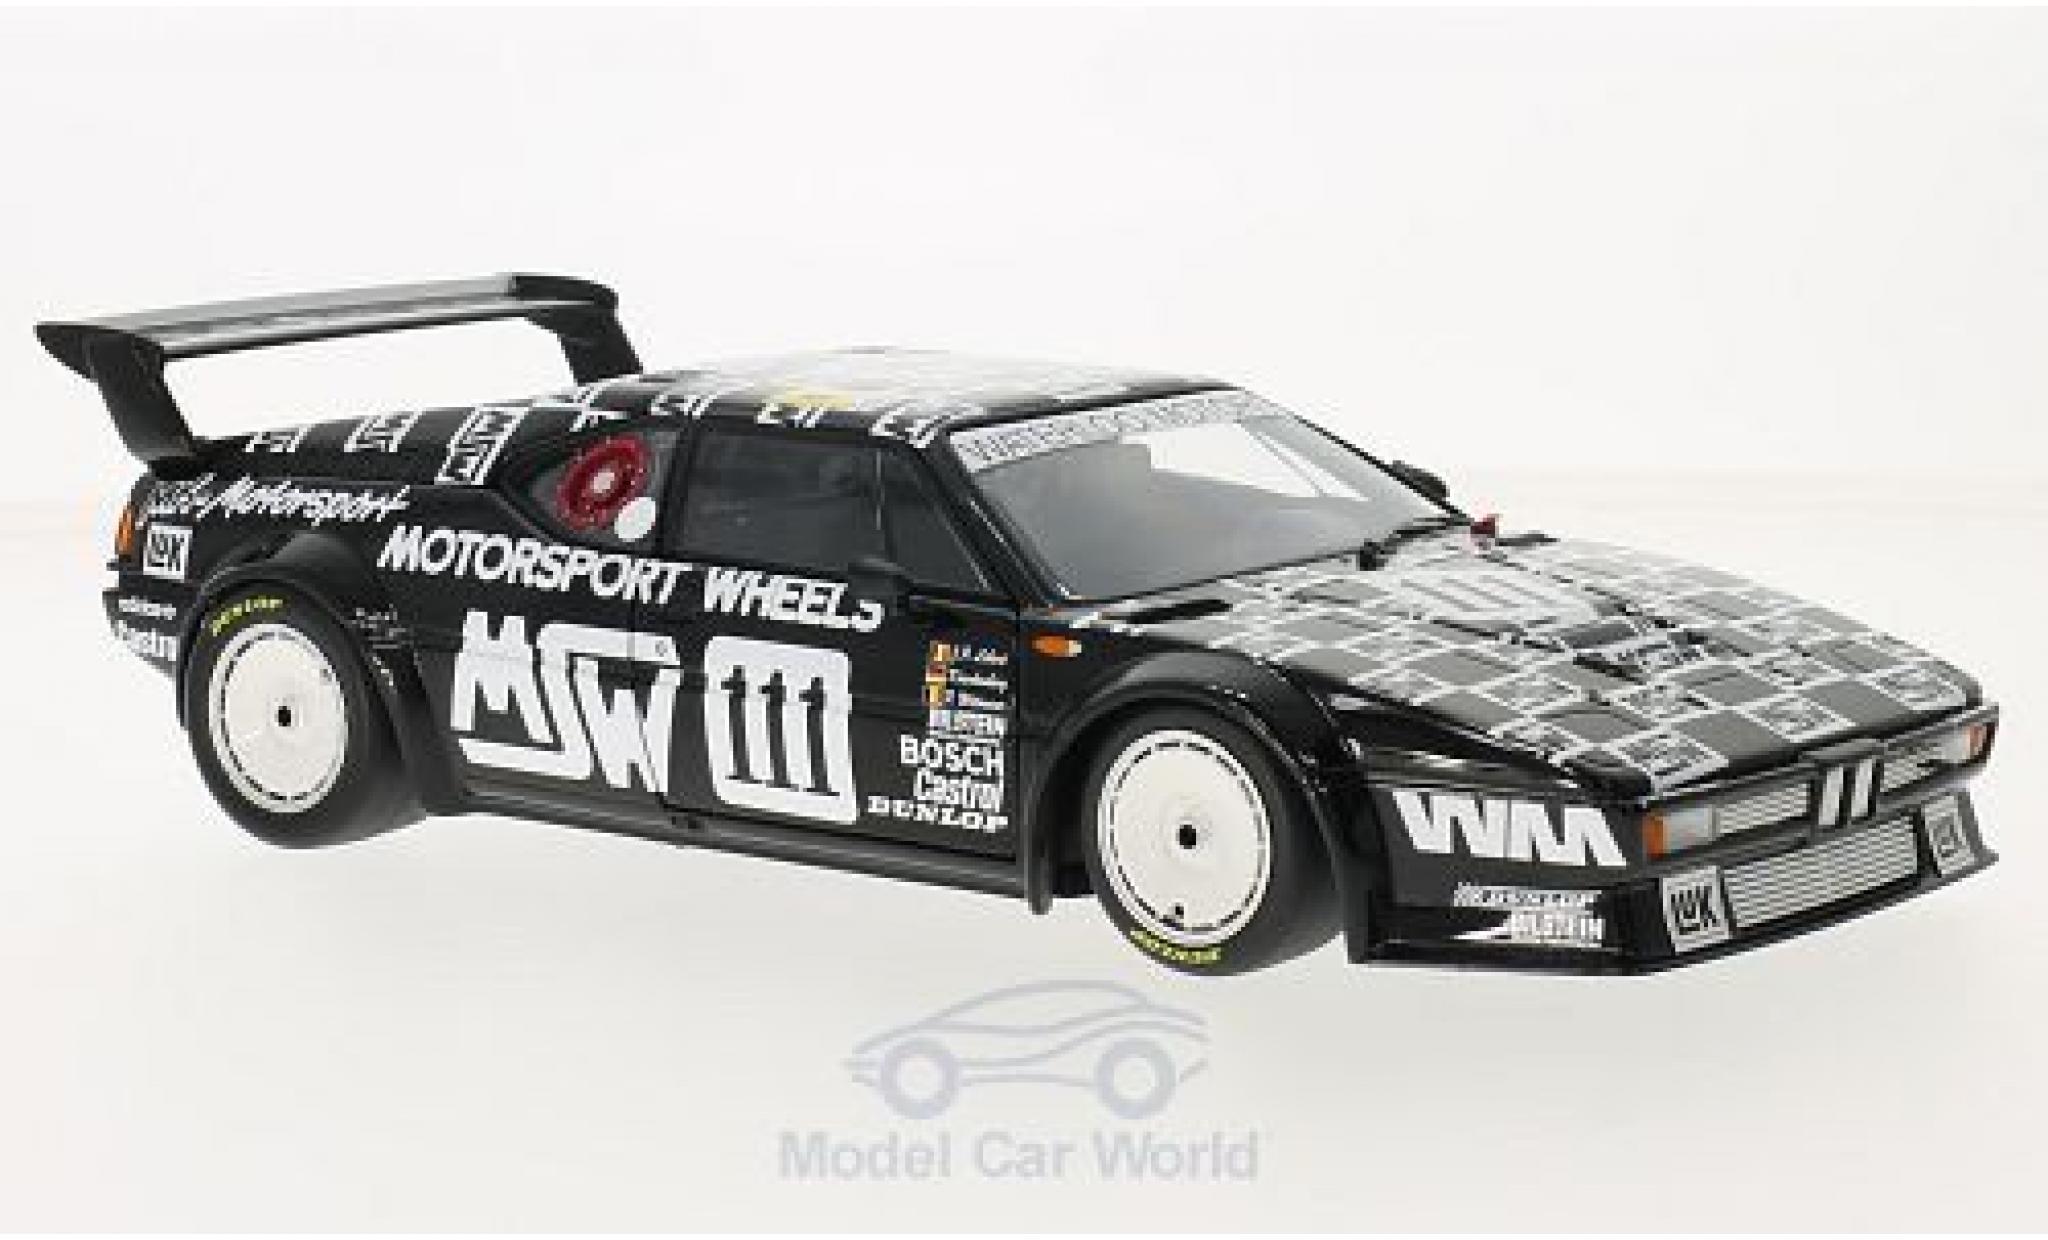 Bmw M1 1986 1/18 Minichamps BMW No.111 MK Motorsport MSW 24h Le Mans 1986 P.Witmeur/M.Krankenberg/J-P.Libert